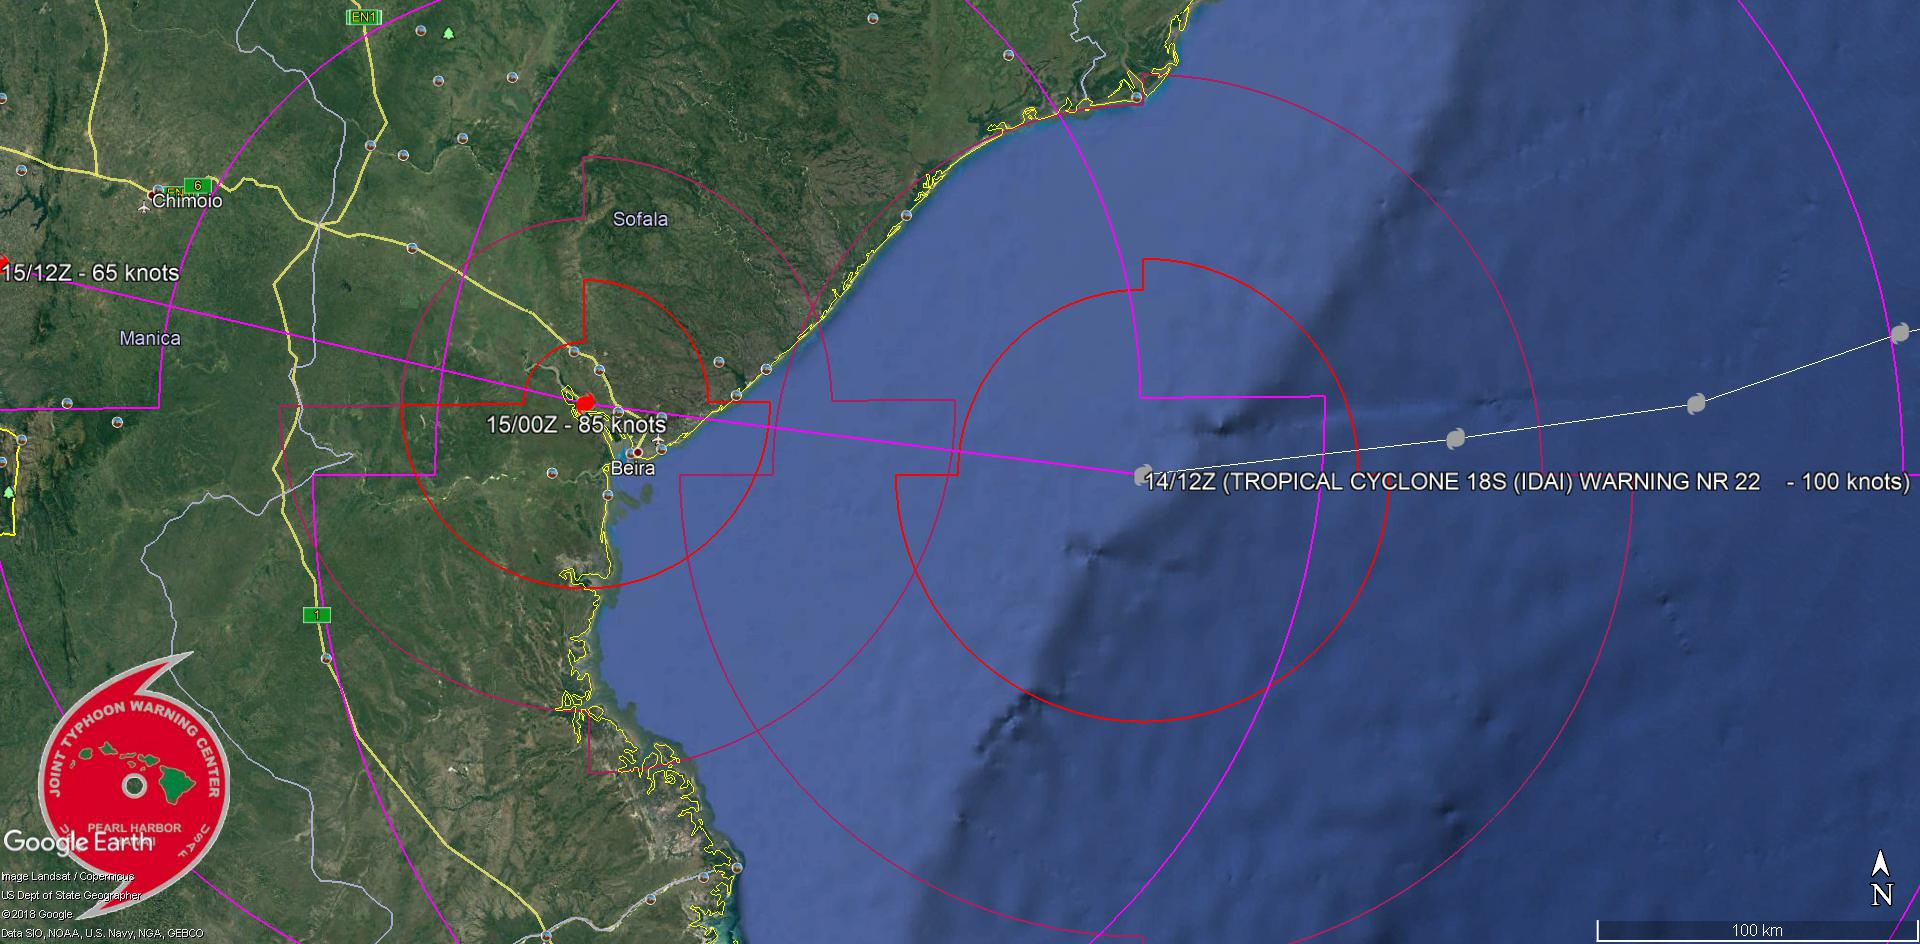 WARNING 22/JTWC